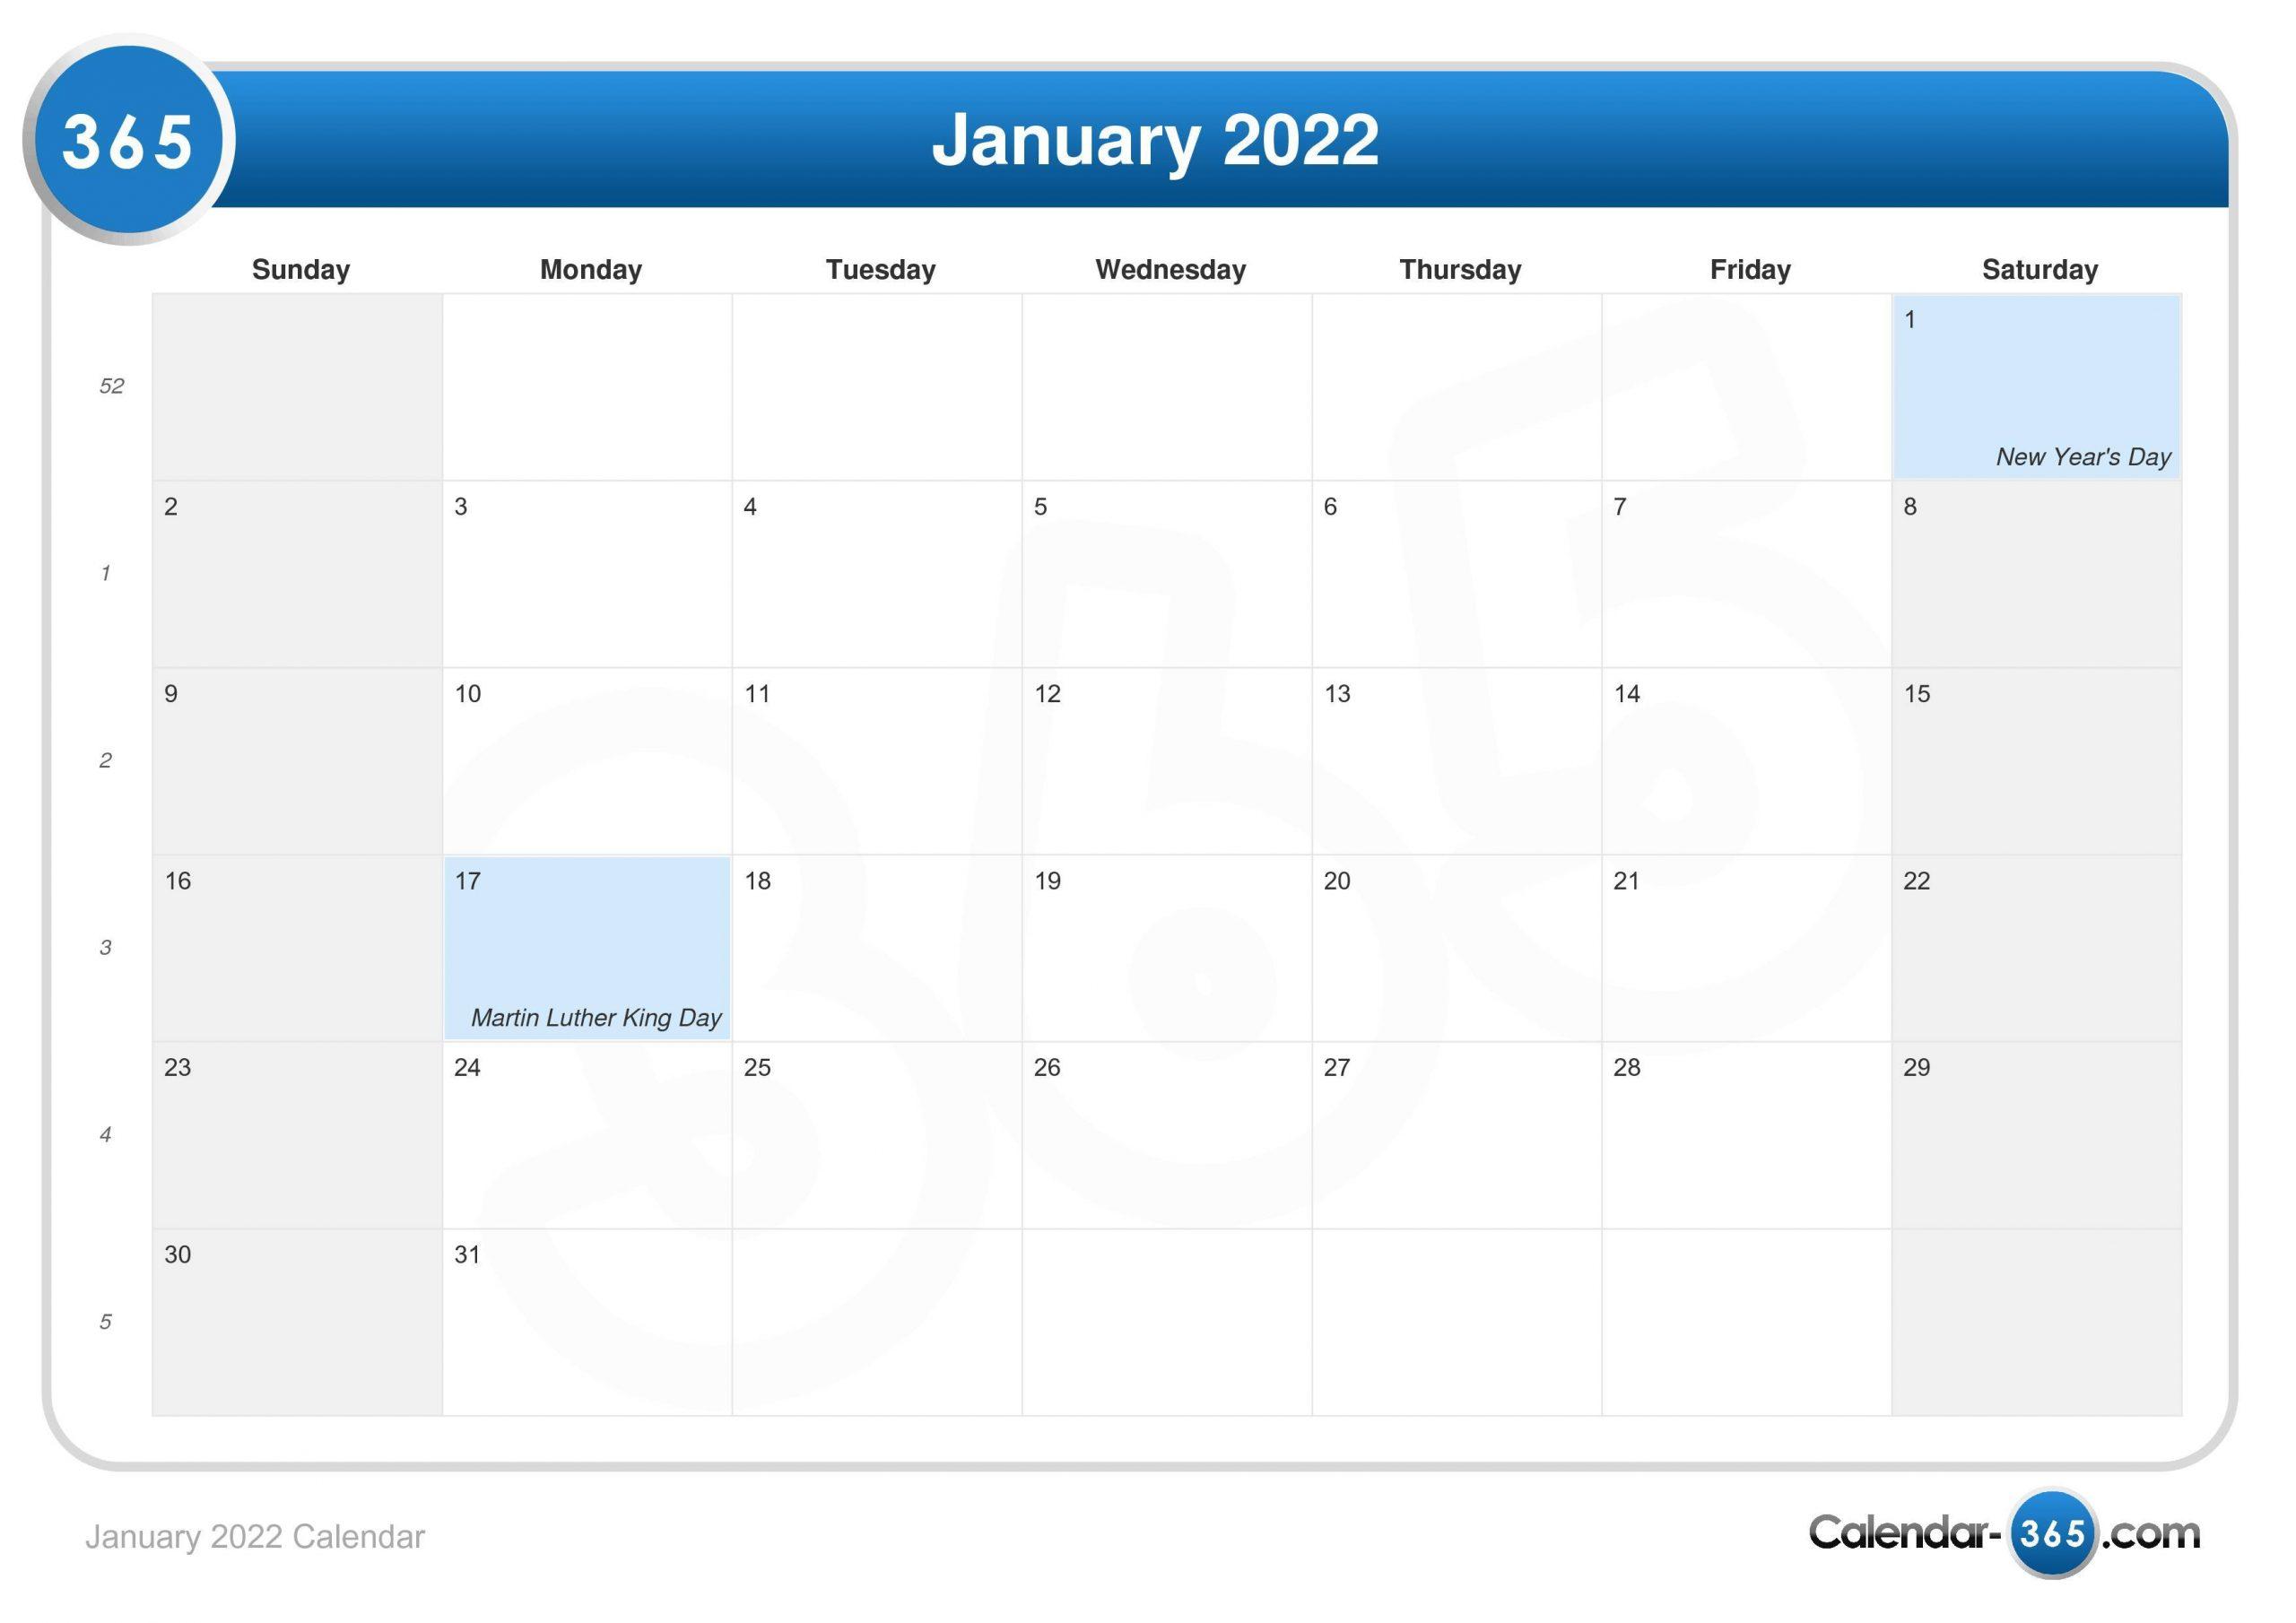 January 2022 Calendar For January Calendar 2022 Full Page